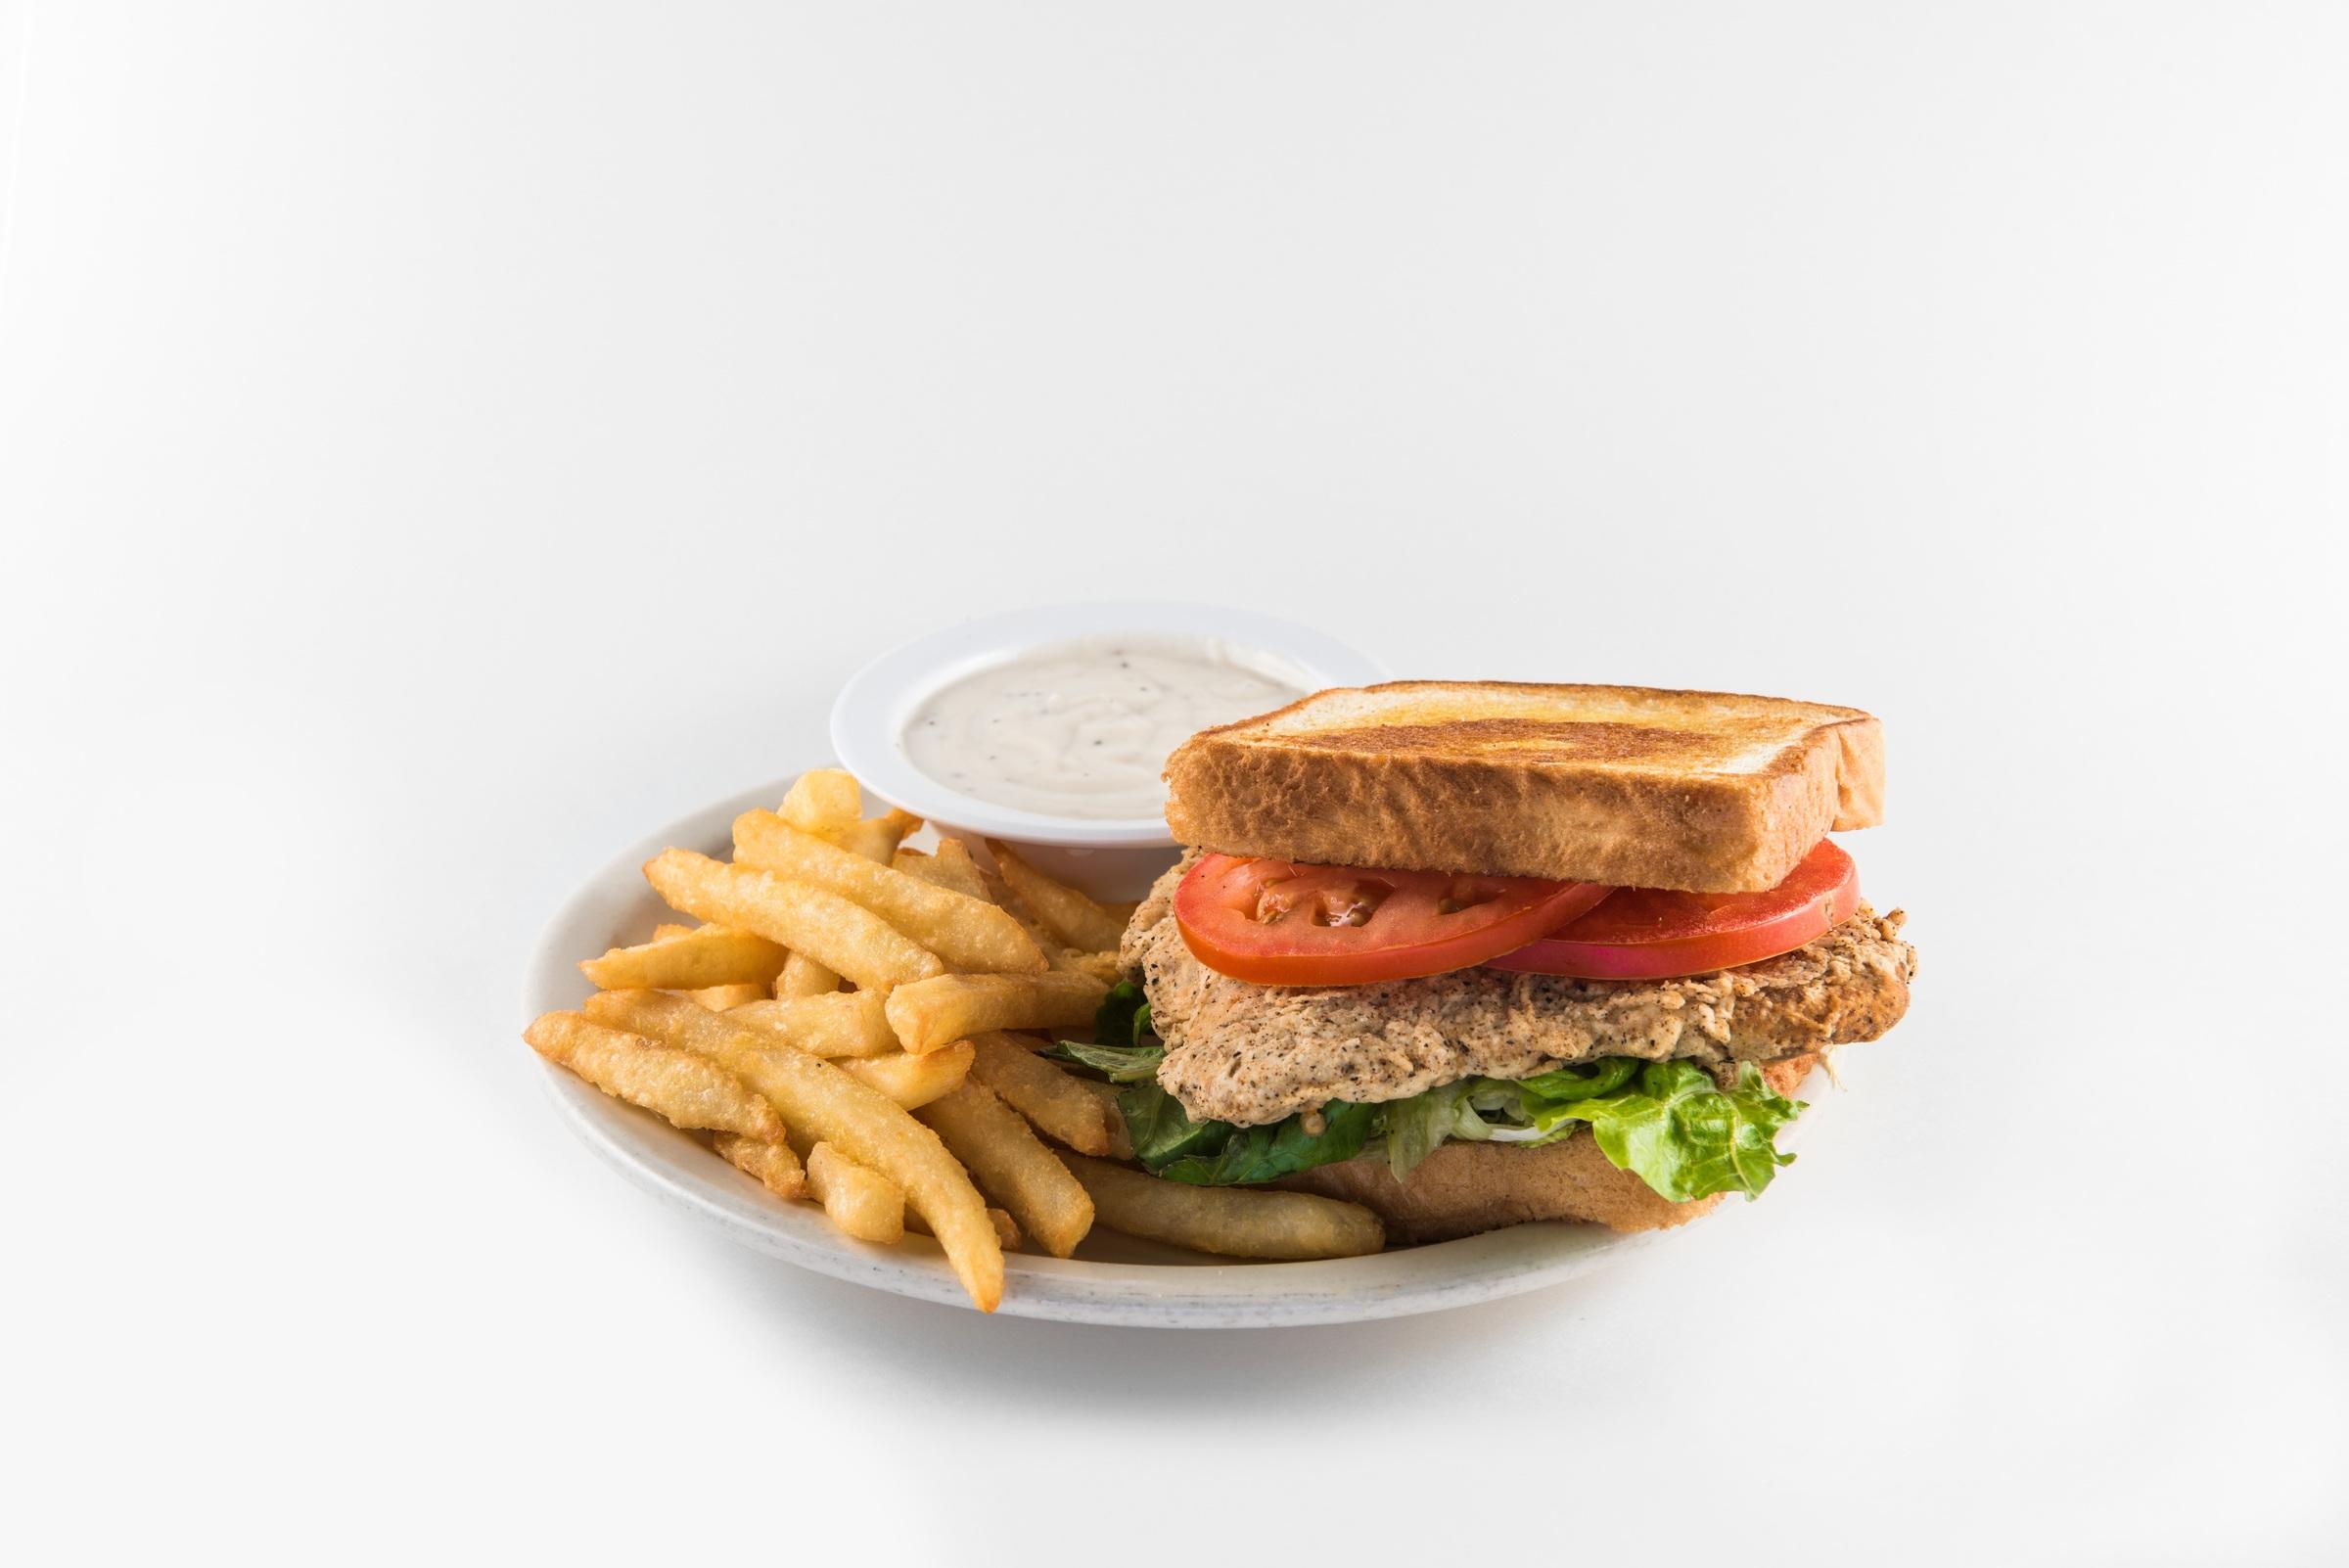 ChickenSandwichPlate